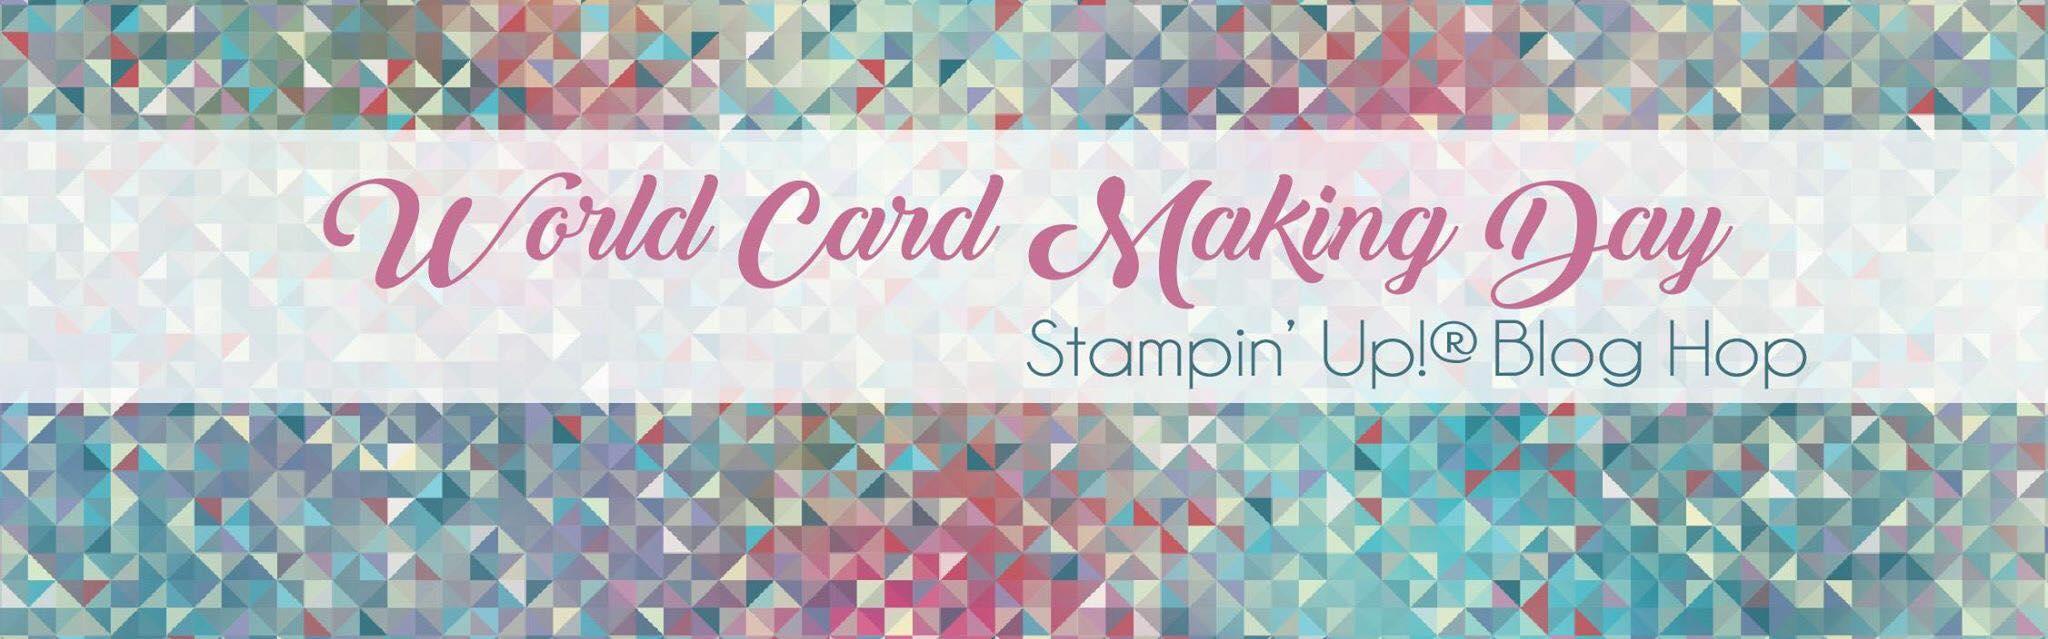 world-cardmaking-day-blog-hop